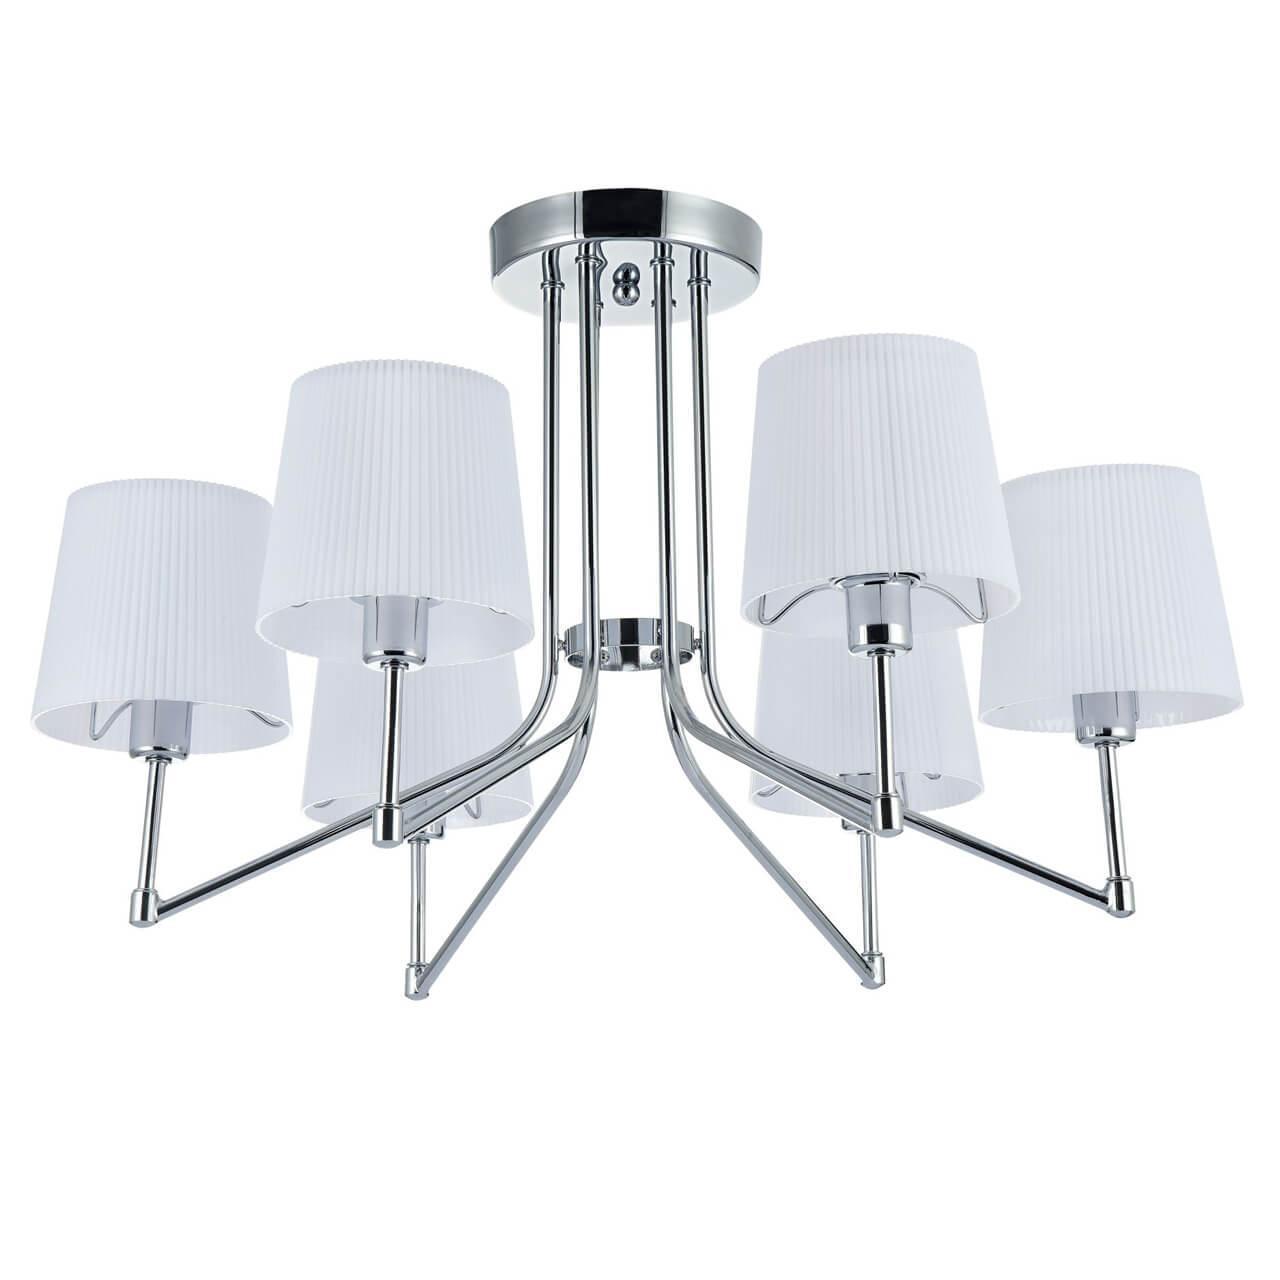 Потолочный светильник Freya FR5051-CL-06-CH, E14, 60 Вт люстра freya freya fr5051 cl 08 ch